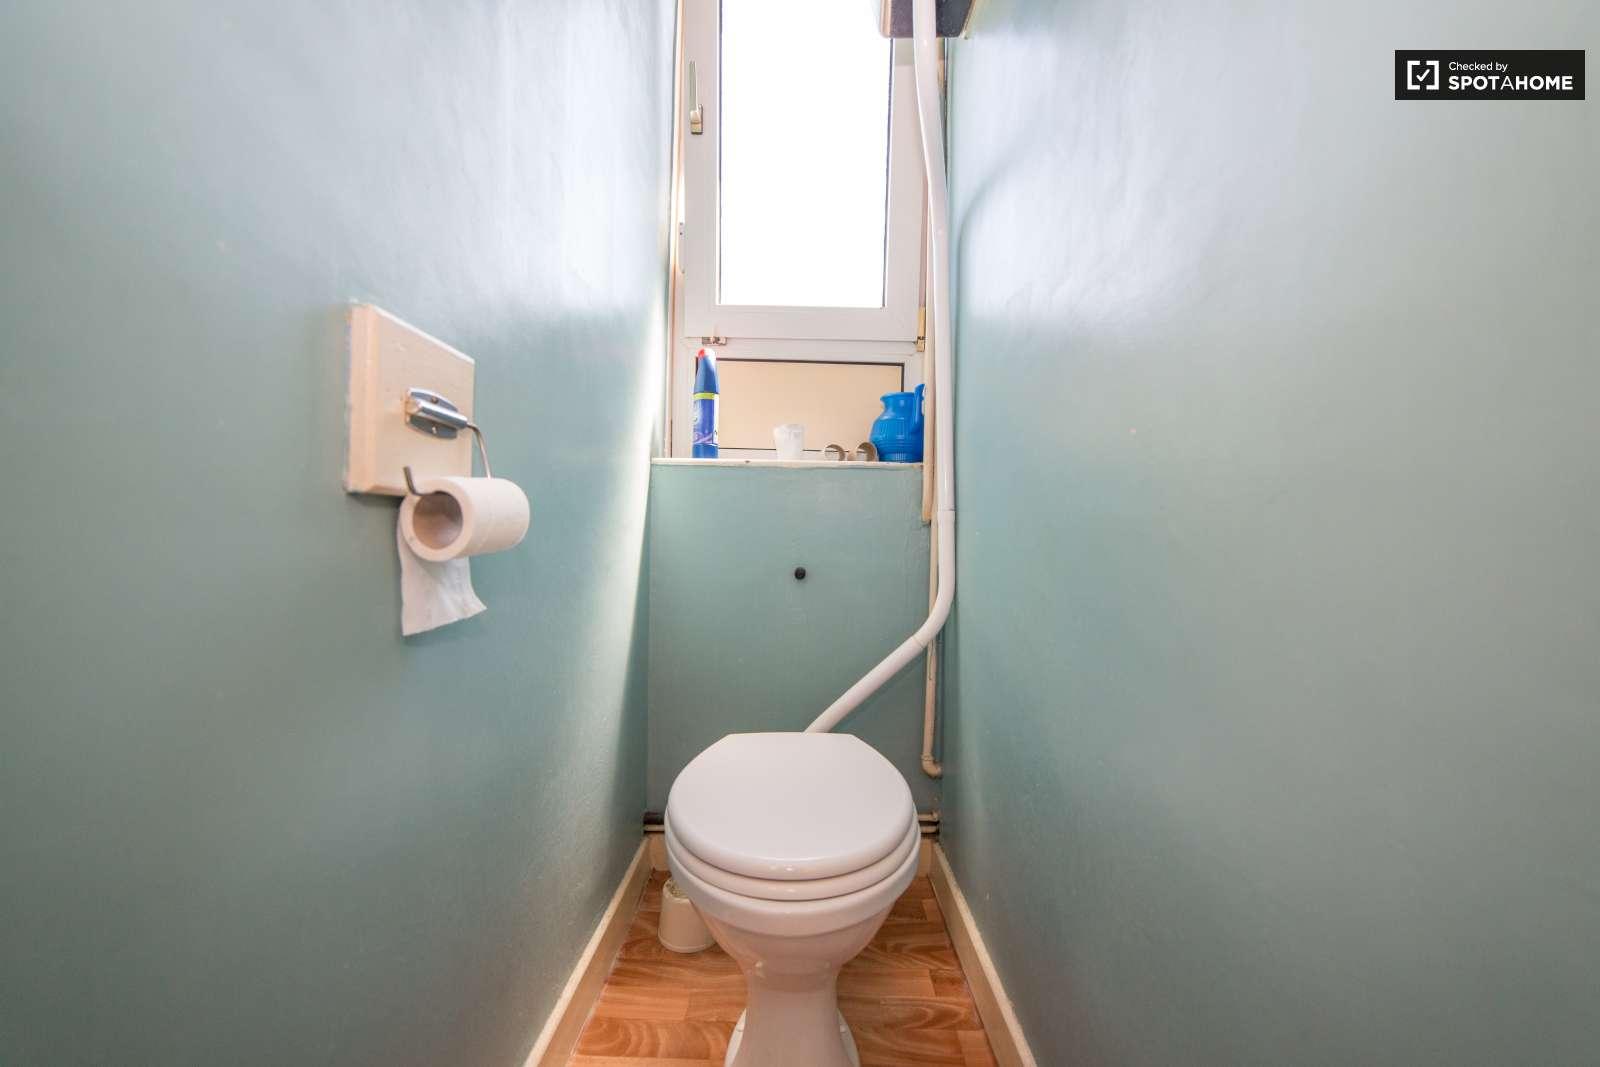 Rooms to rent in 4-bedroom flat in Tower Hamlets, London (ref ...